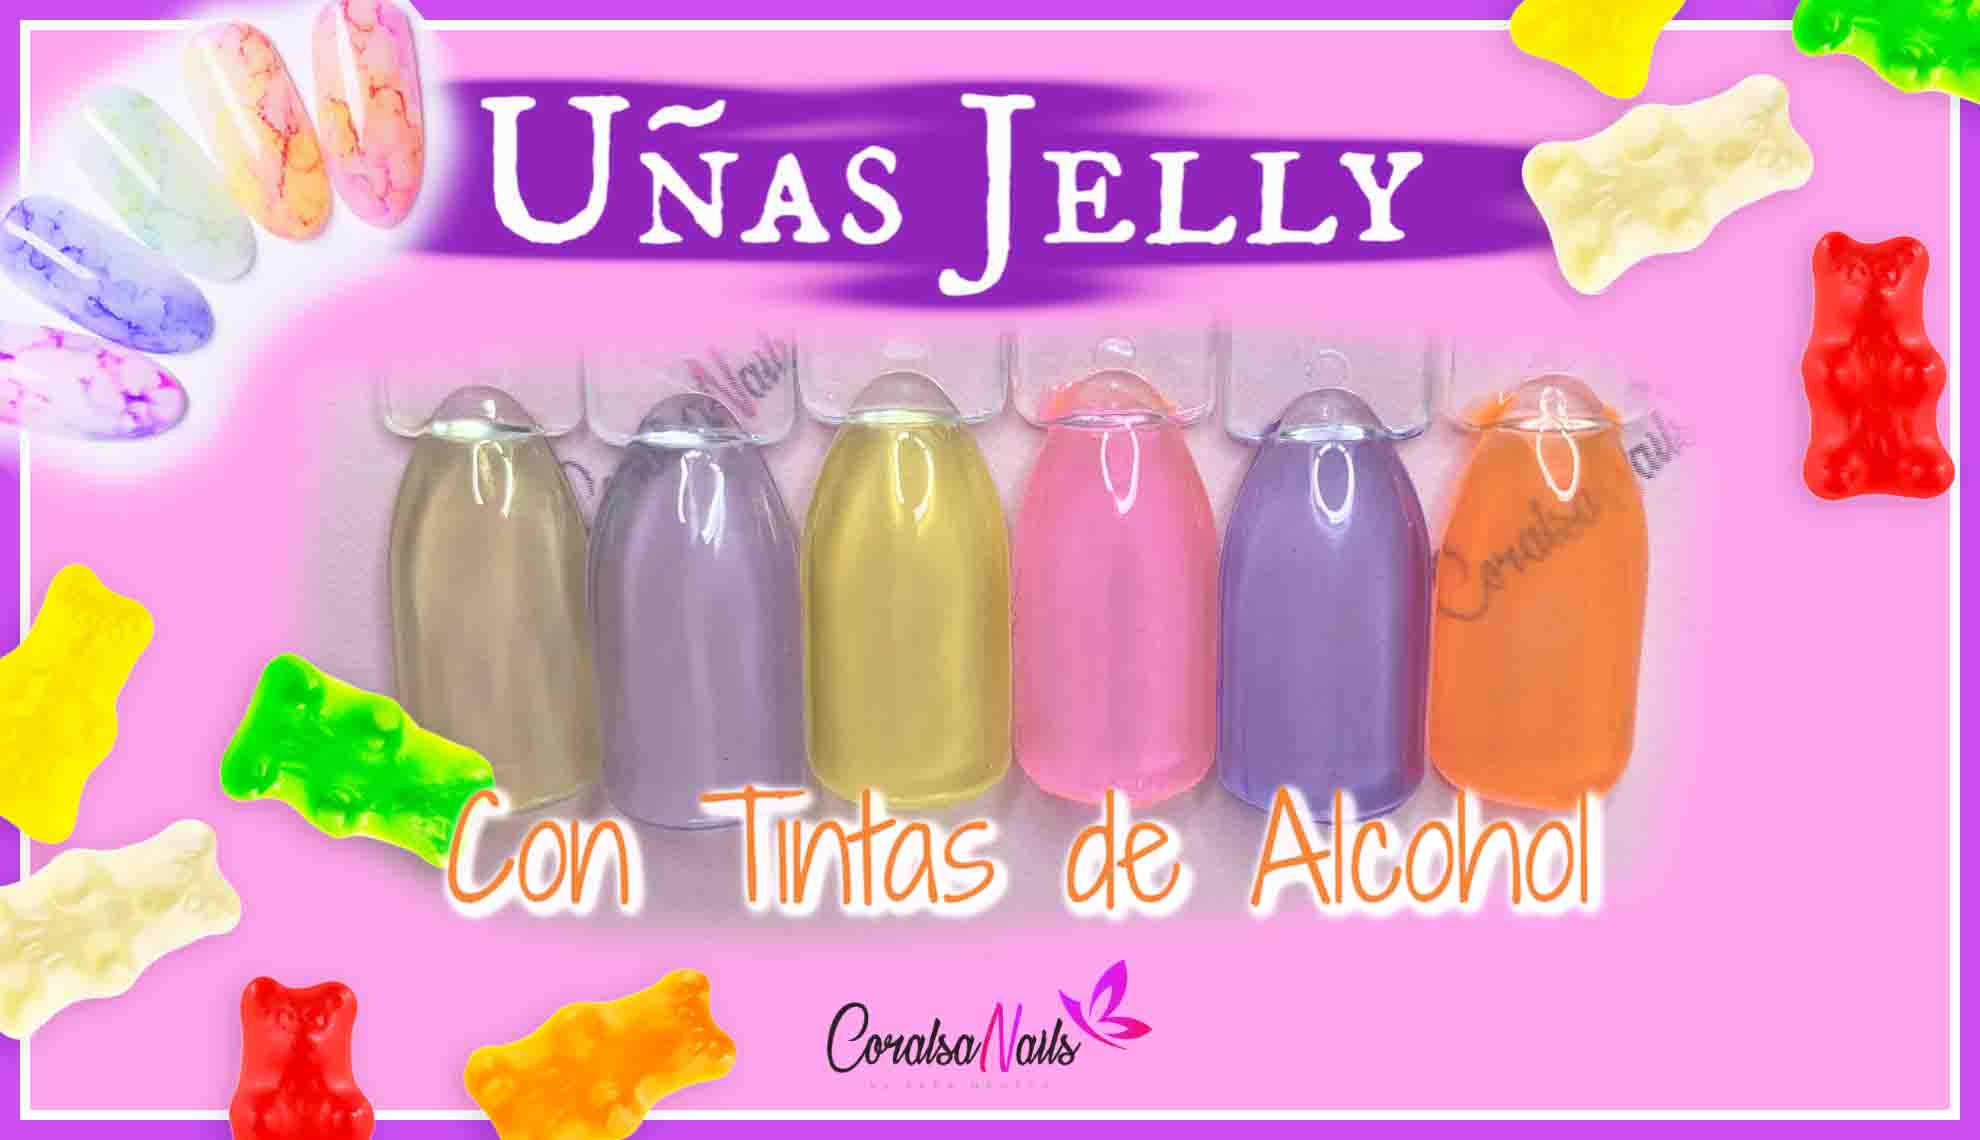 Uñas Jelly con Tintas de Alcohol